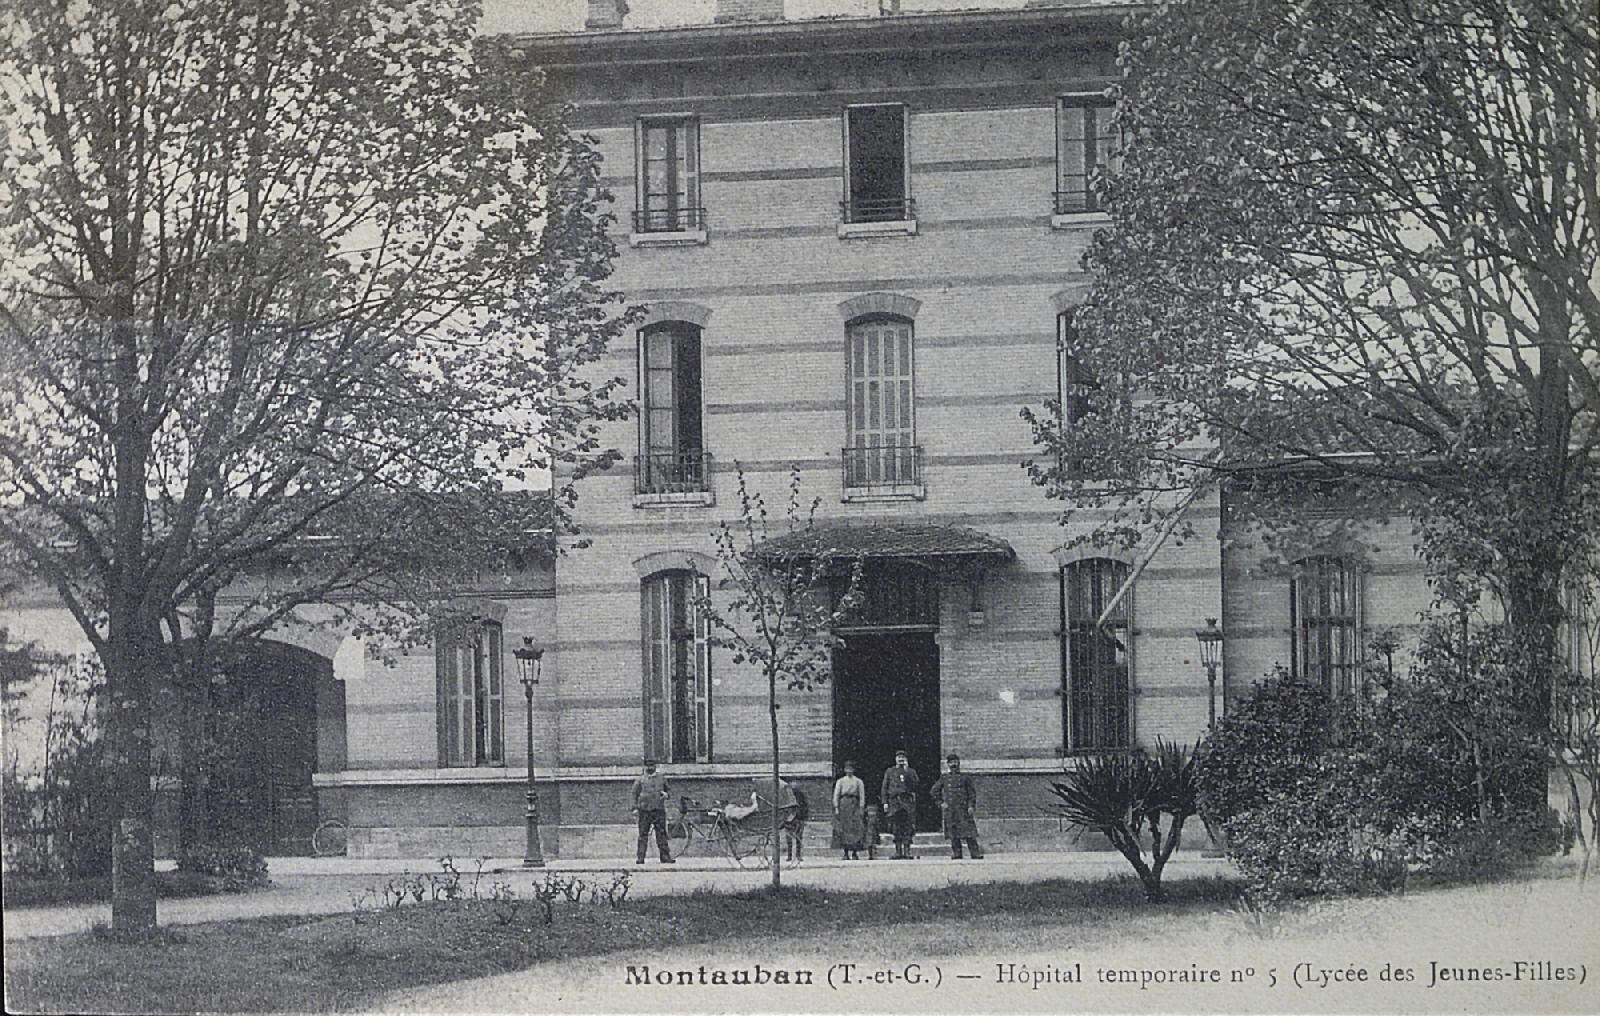 Hôpital temporaire n°5